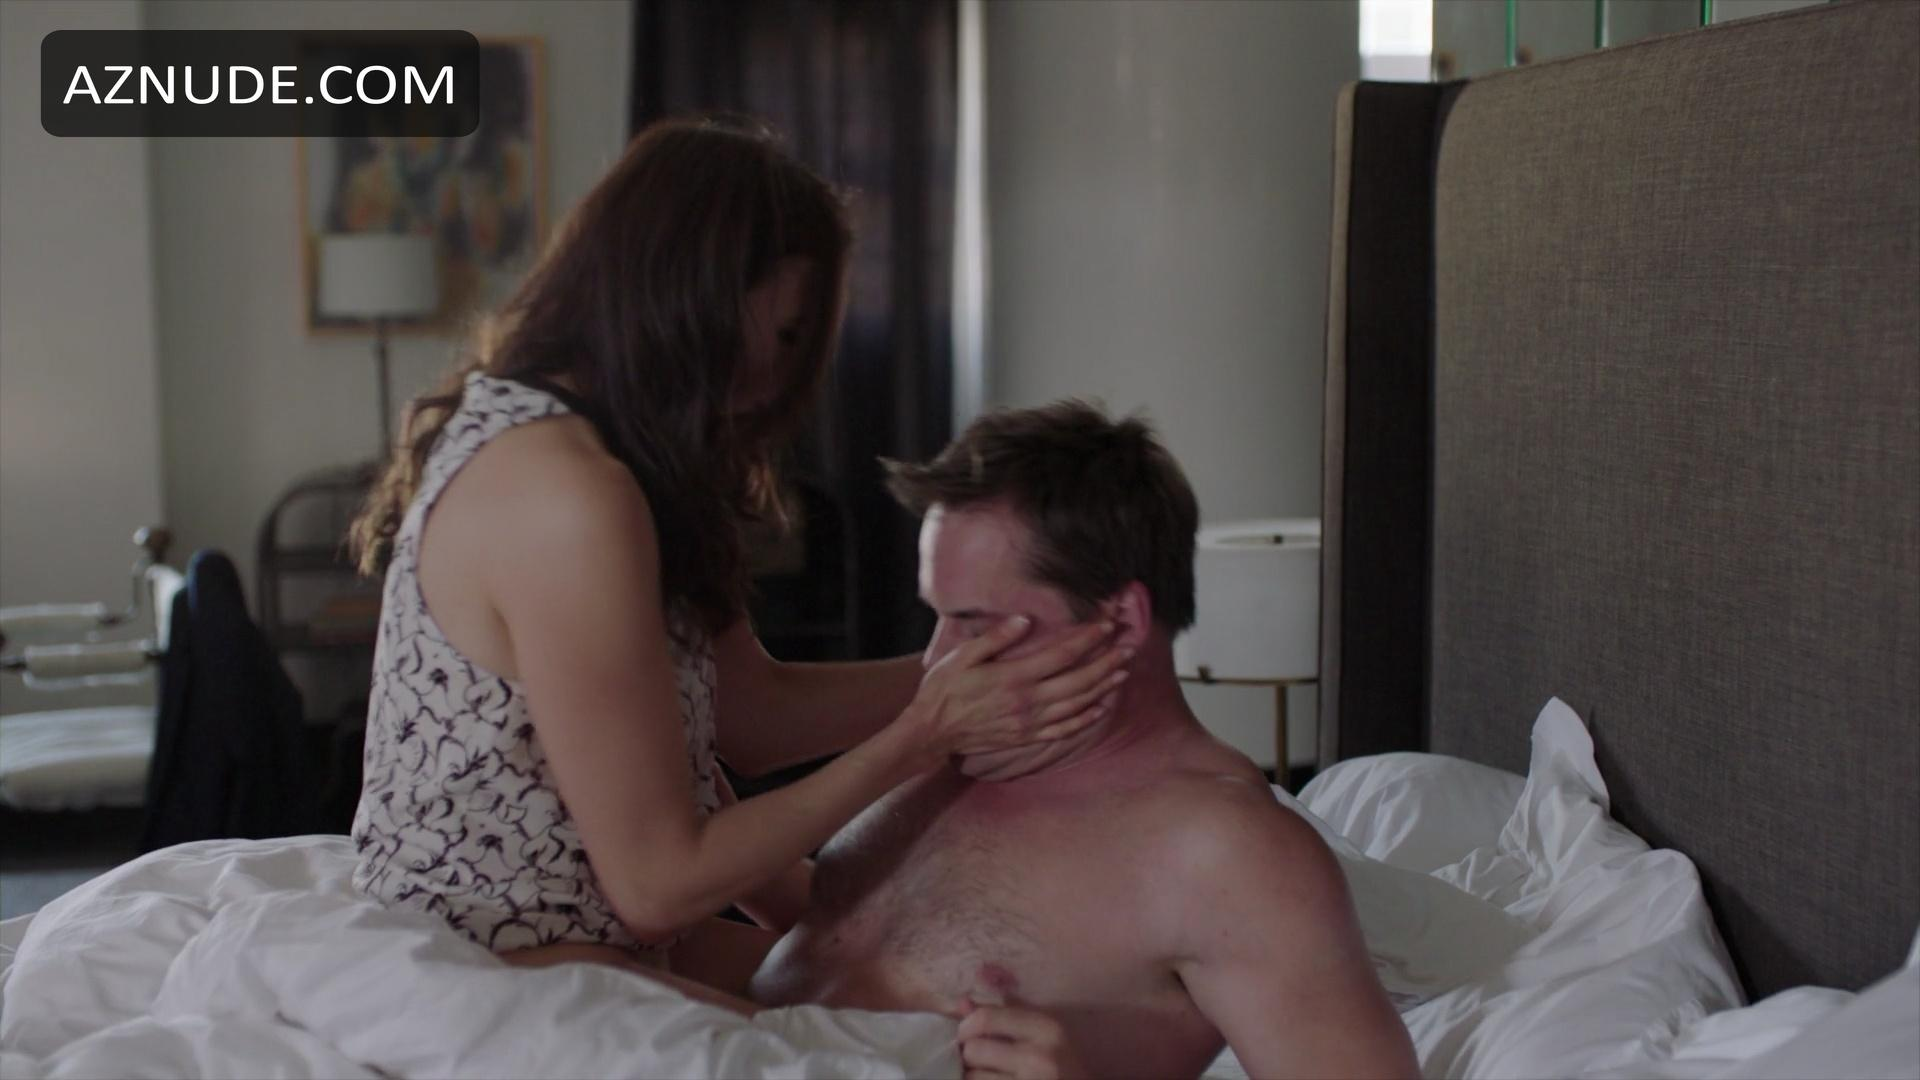 Casual Nude Scenes - Aznude Men-8042